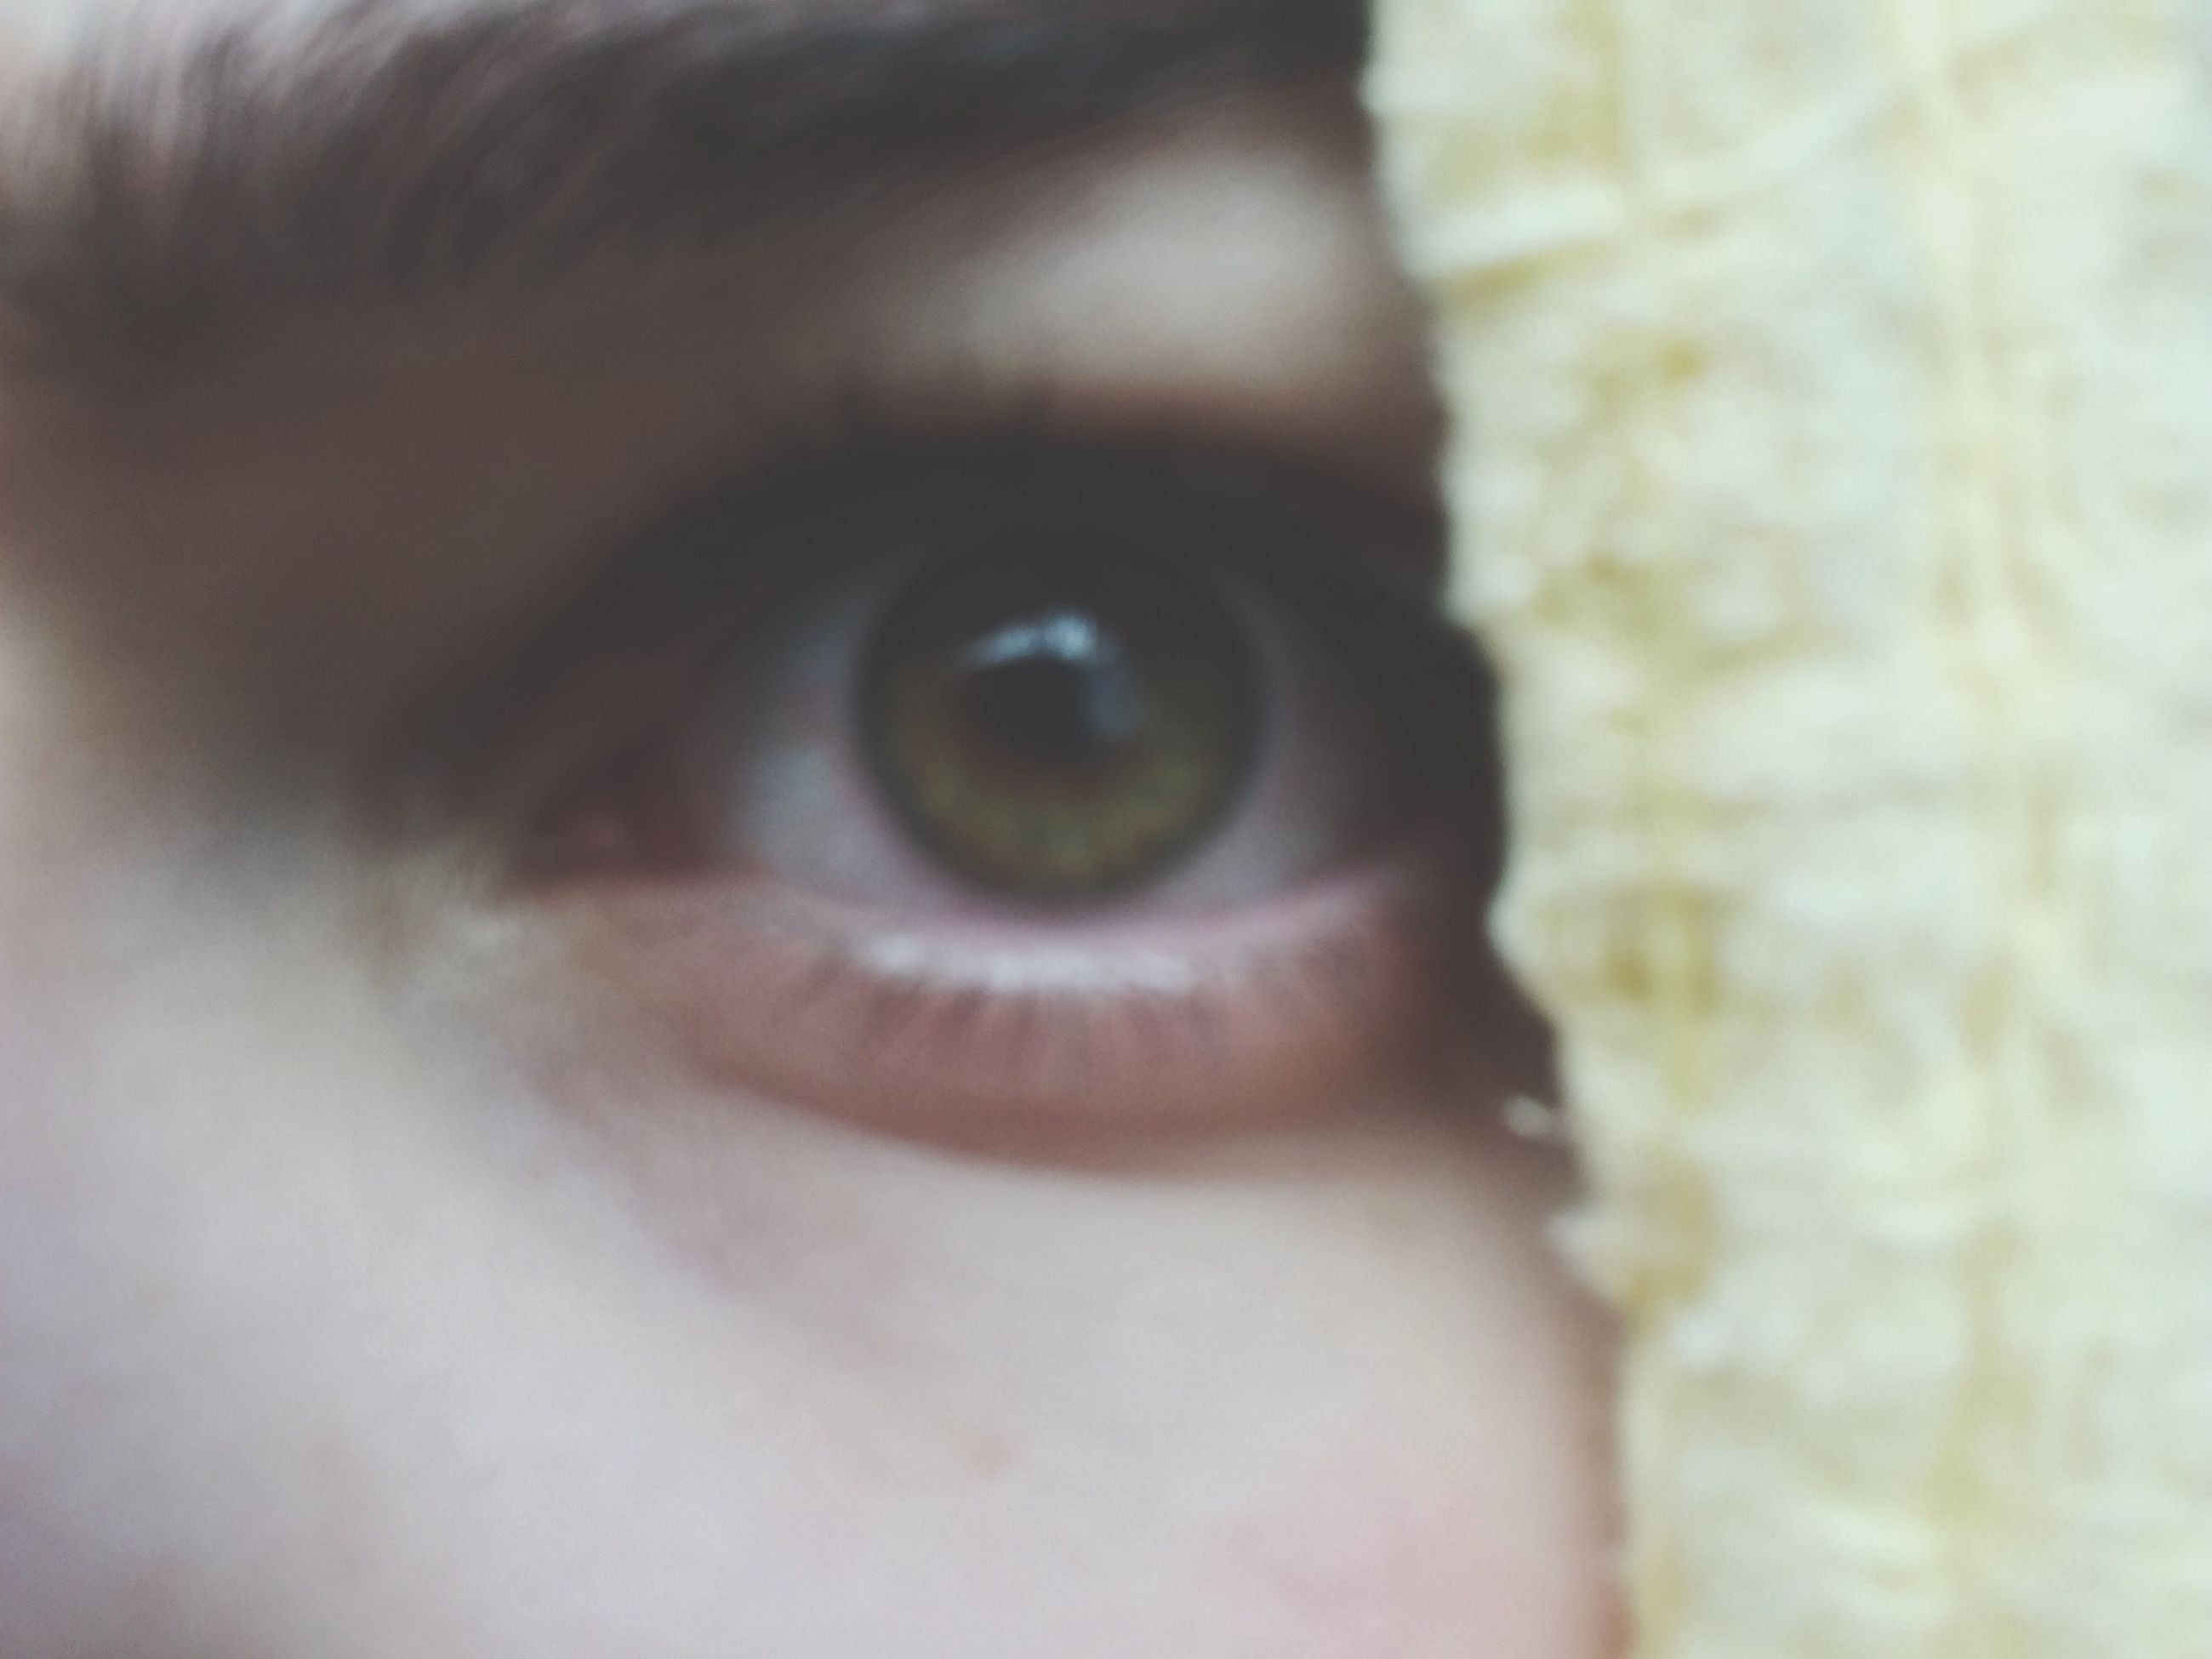 human eye, close-up, looking at camera, eyesight, selective focus, full frame, extreme close-up, focus on foreground, human face, eyelash, eyeball, looking, human skin, iris - eye